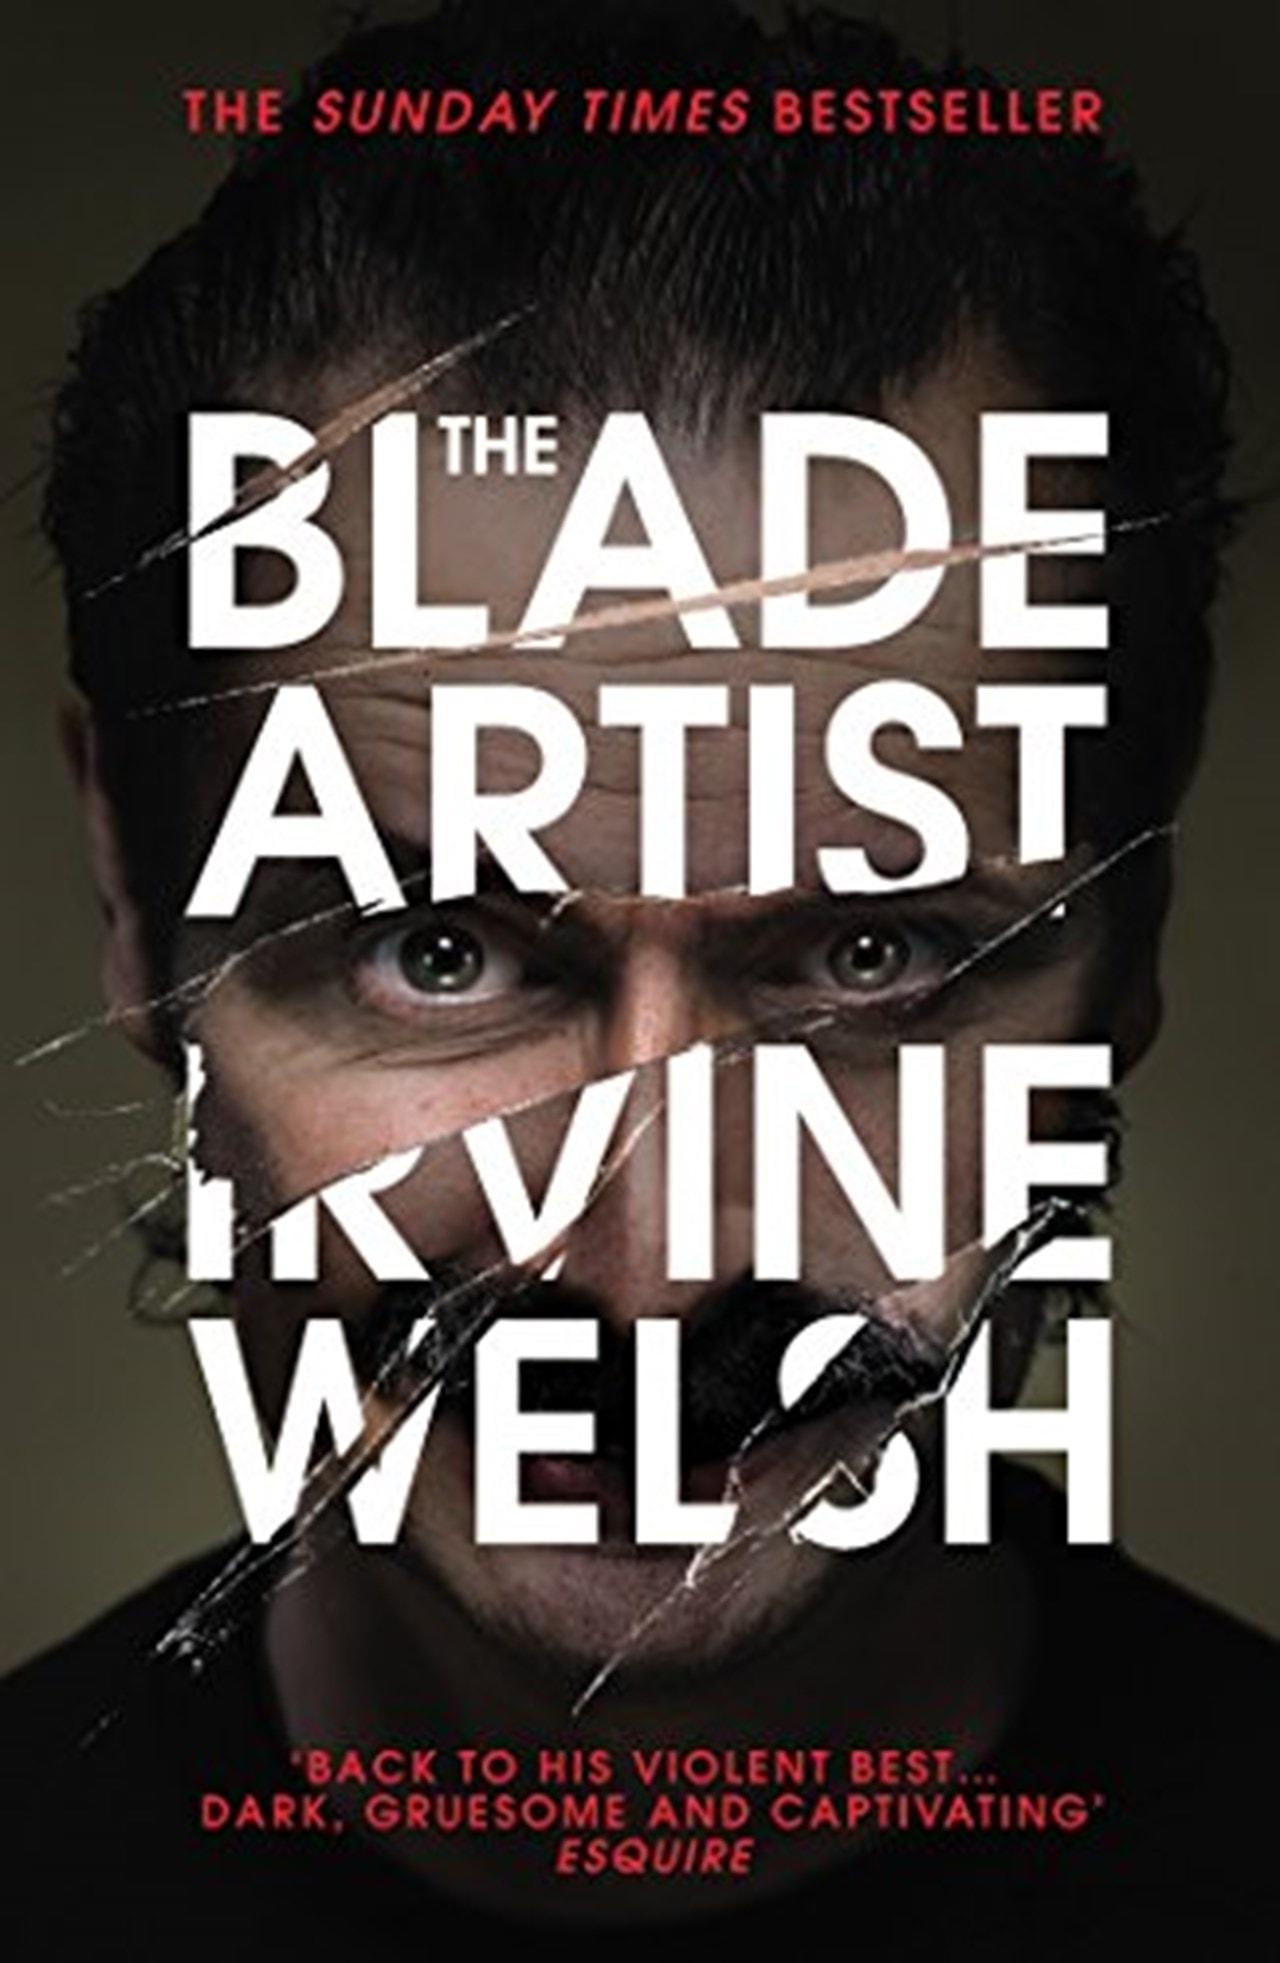 The Blade Artist - 1